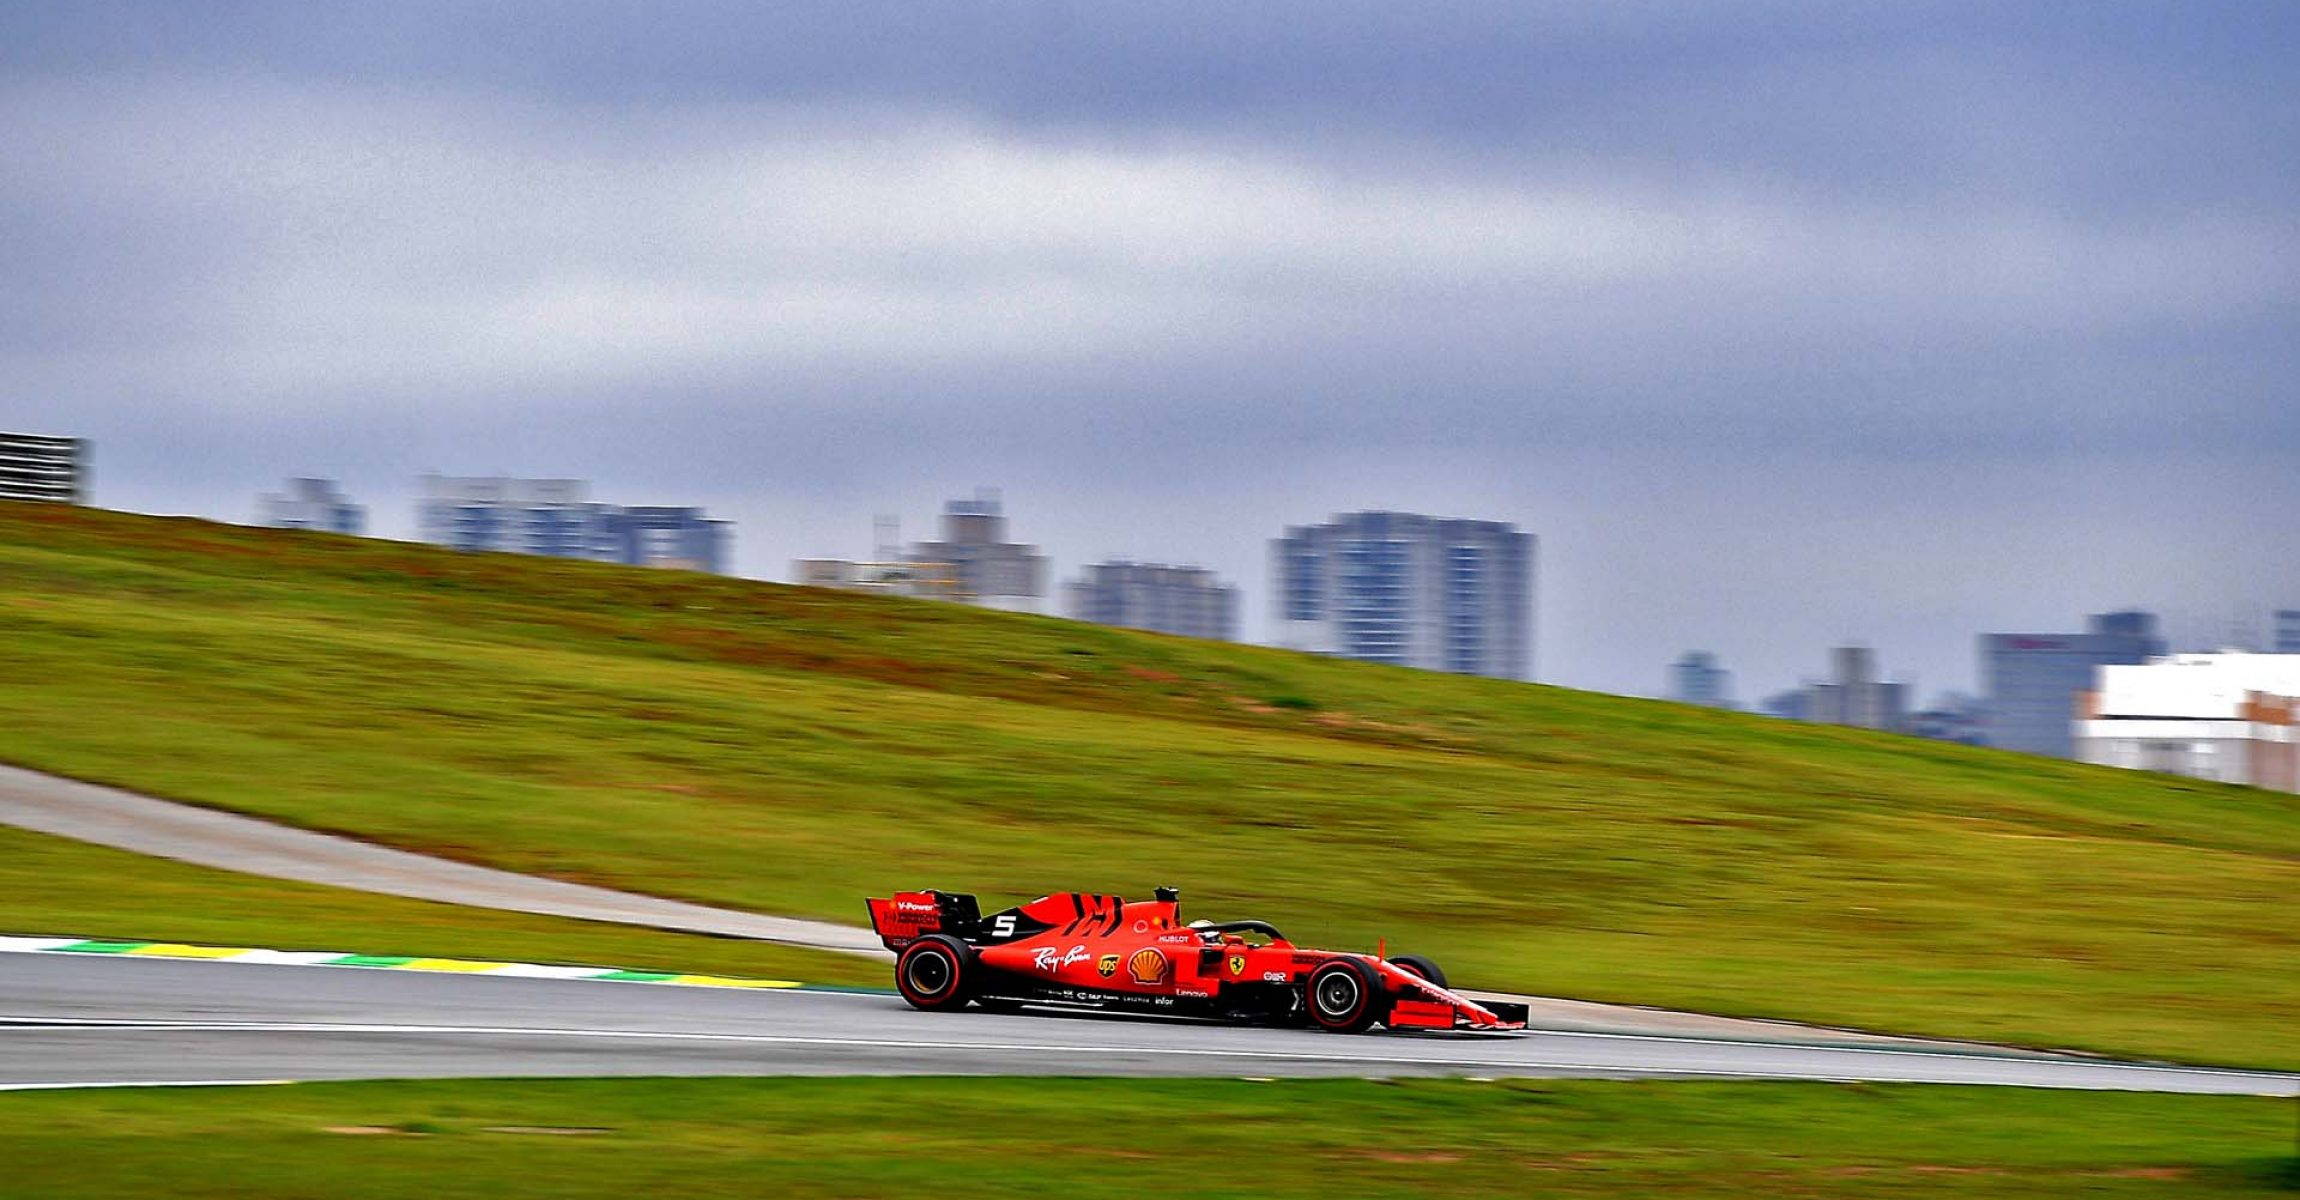 GP BRASILE F1/2019 - VENERDÌ 15/11/2019 credit: @Scuderia Ferrari Press Office Sebastian Vettel